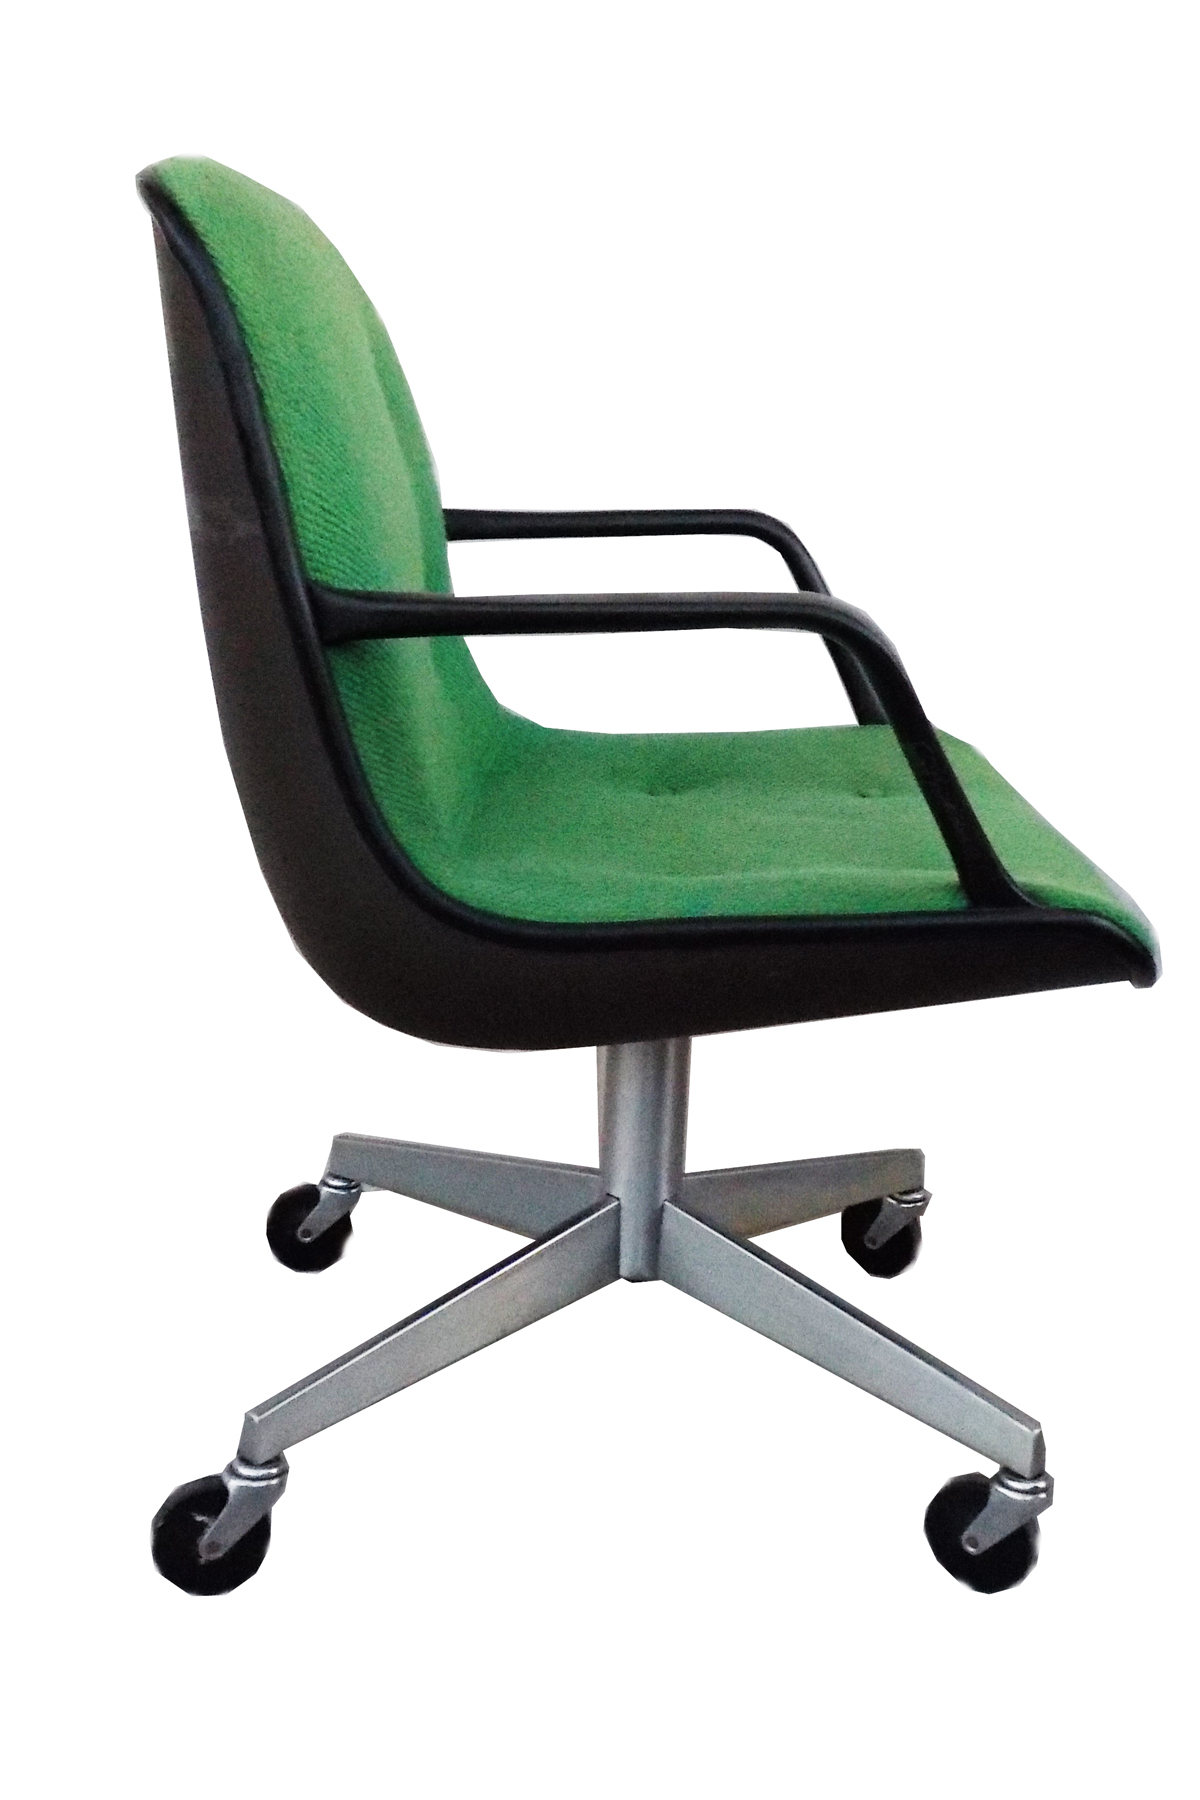 midcentury modern steelcase vintage green office chair image 4 of 6